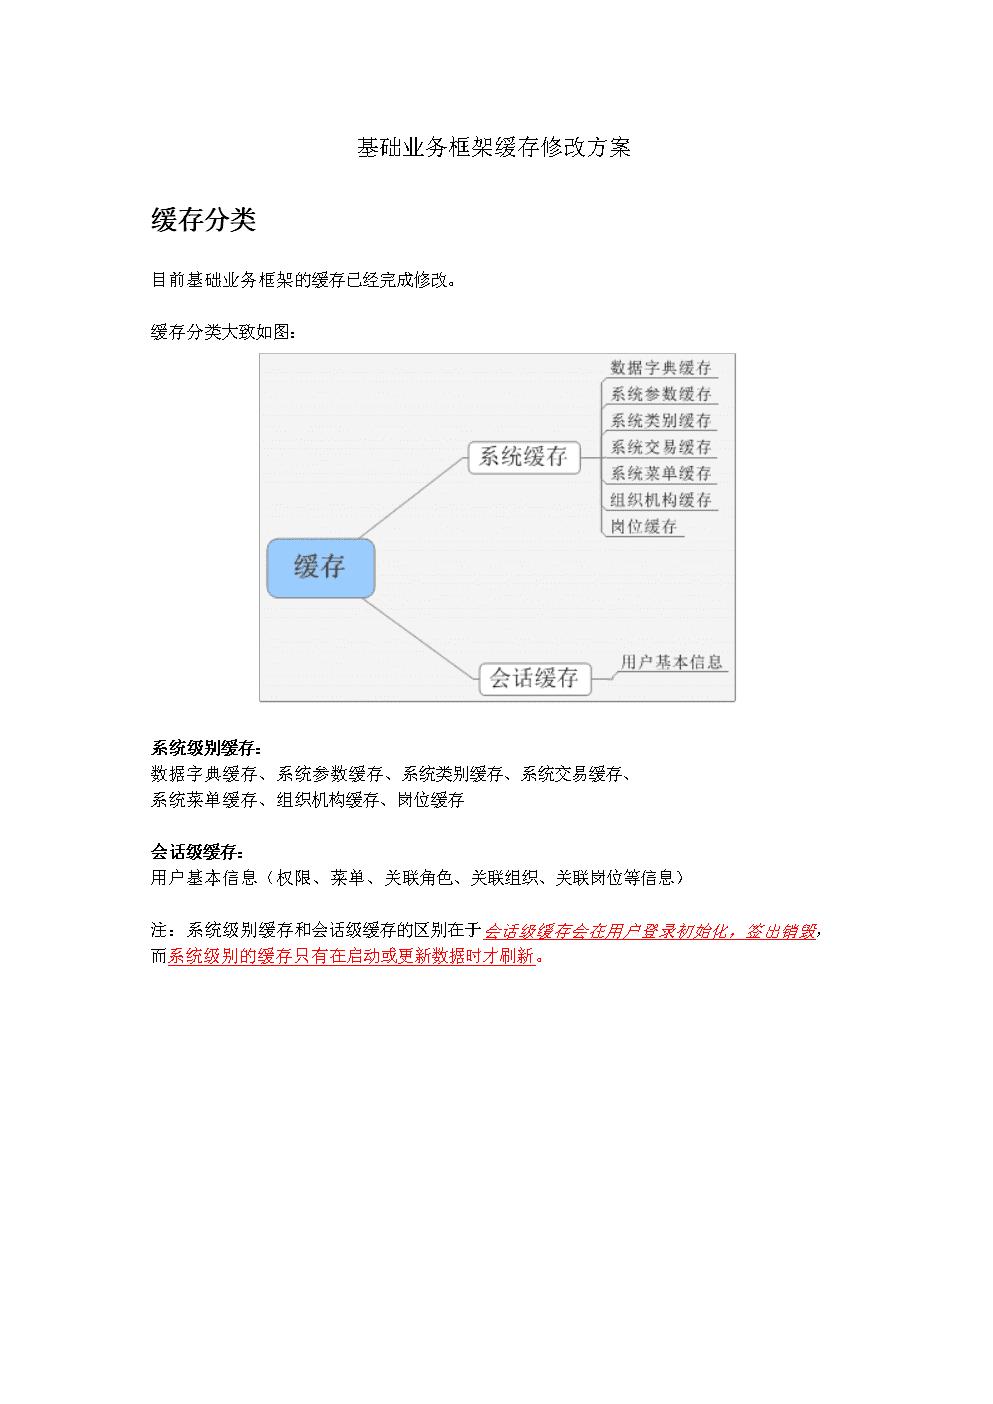 Bizframe缓存-缓存修改方案.docx